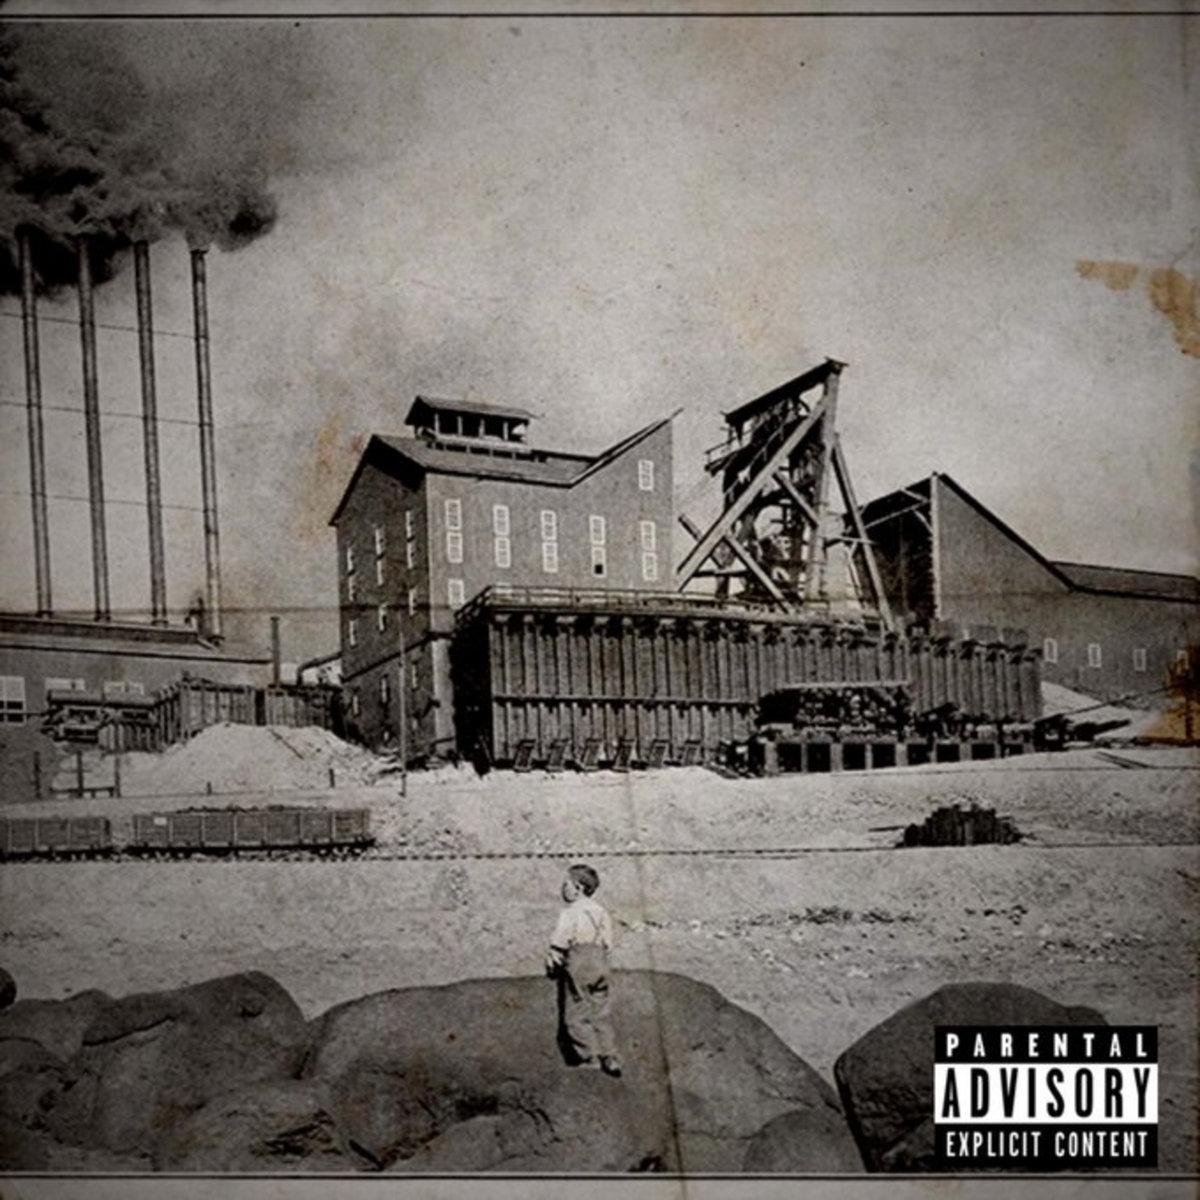 Bloodblixing, Blicky Boyz (2 Dolla Will, Lil Curbstomp, Yung Regis) - BLICKY BOYZ: GANGSTA EDITION LP